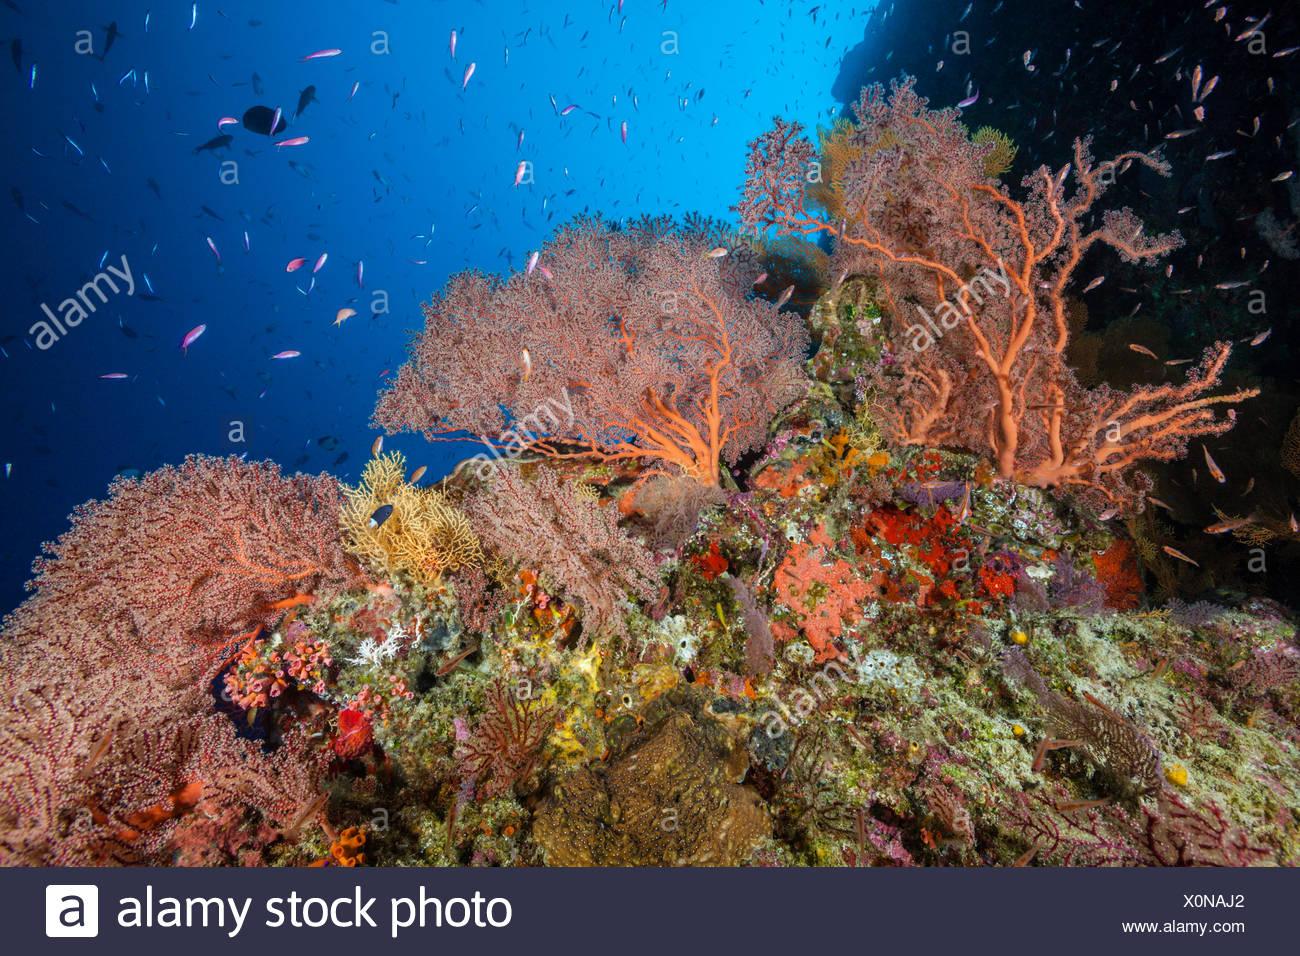 Coral Reef of Sea Fans, Gorgonaria, Christmas Island, Australia Stock Photo